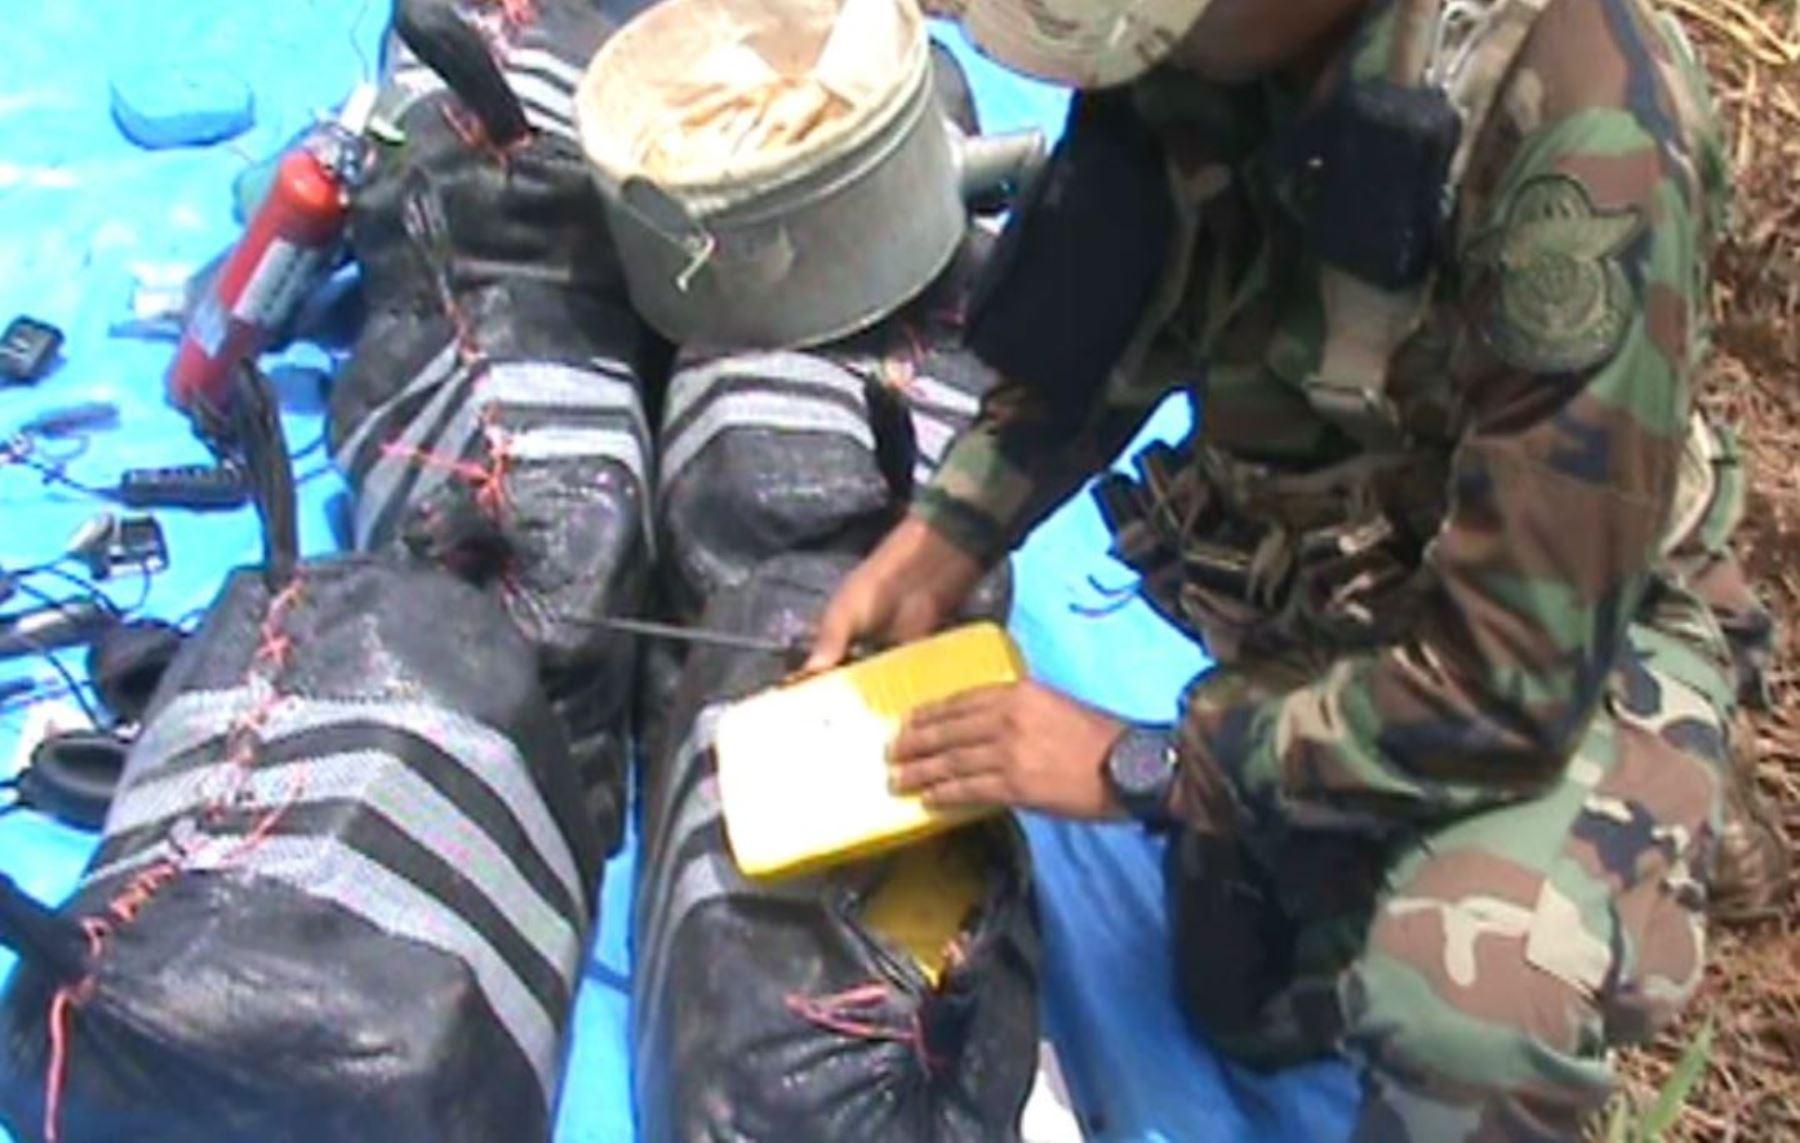 Policía decomisó 288.8 kilos de cocaína del interior de la avioneta intervenida en el Vraem. Foto: ANDINA.